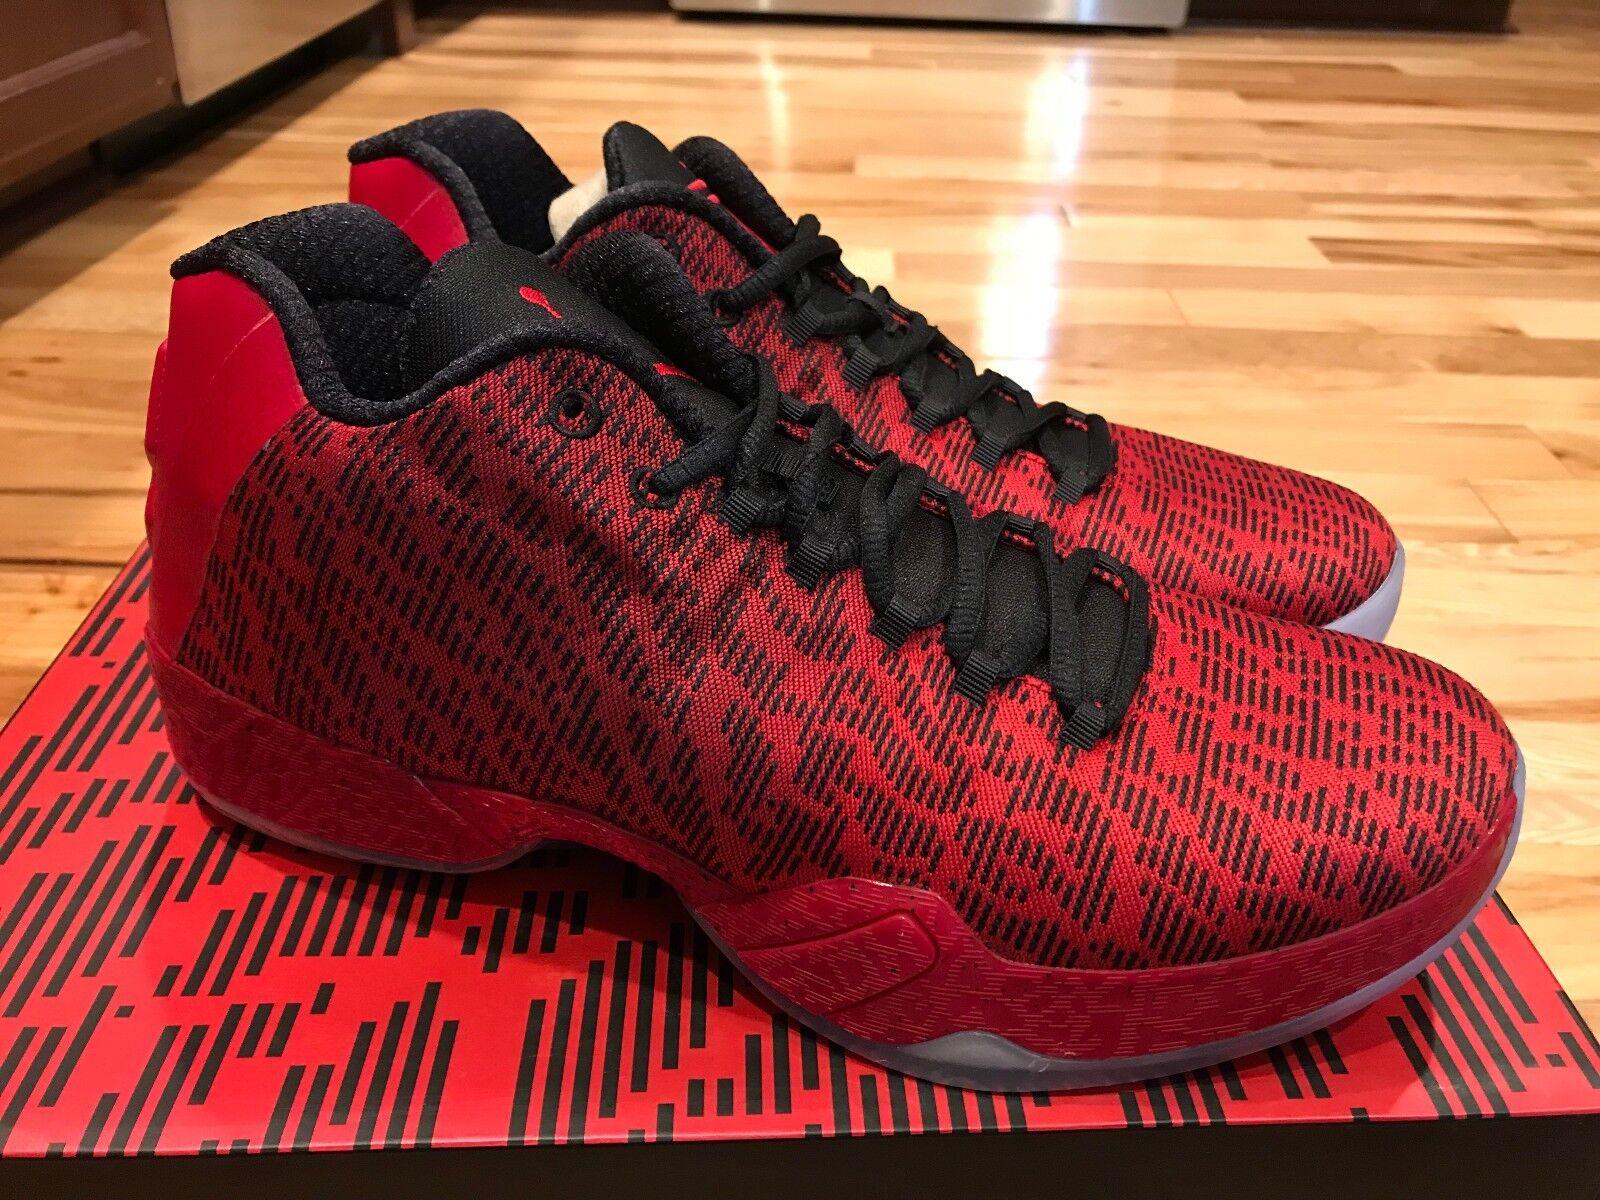 Nike Nike Nike air jordan 29 xx9 niedrigen jimmy butler pe fitnessstudio rot / schwarz 855514-605 größe 10,5 23c308